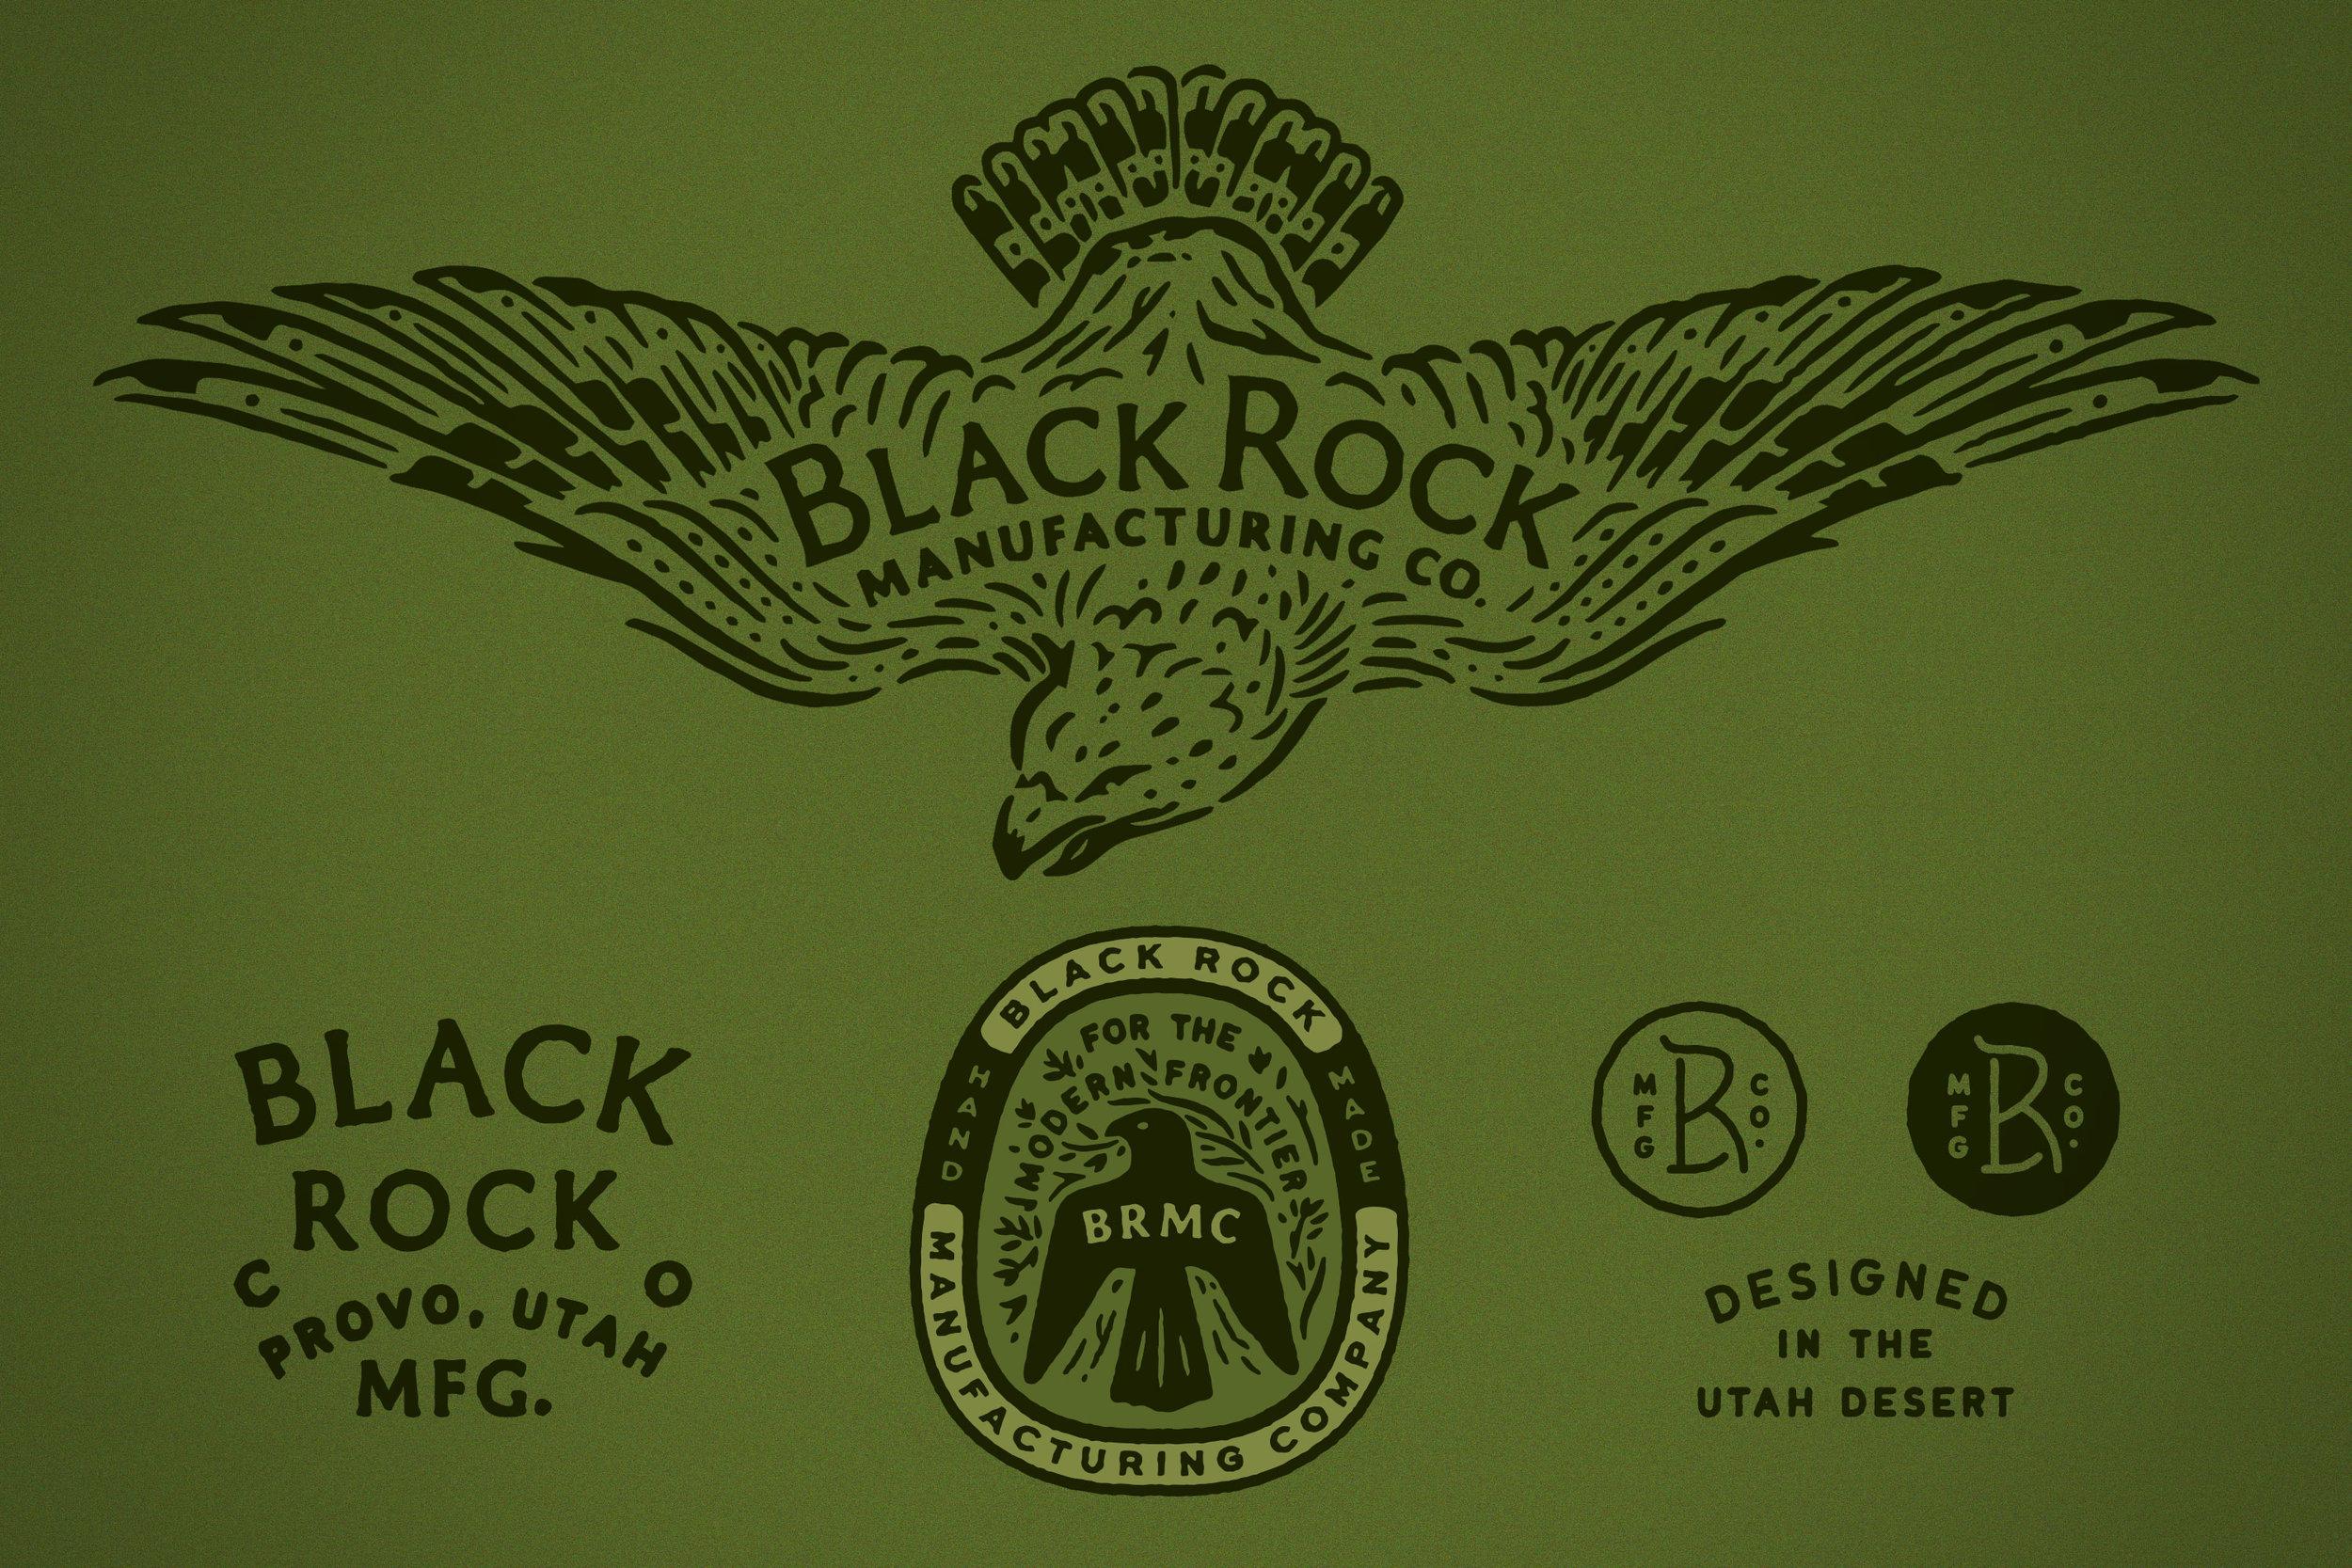 Black Rock Mfg. Co. Branding Logo Sheet